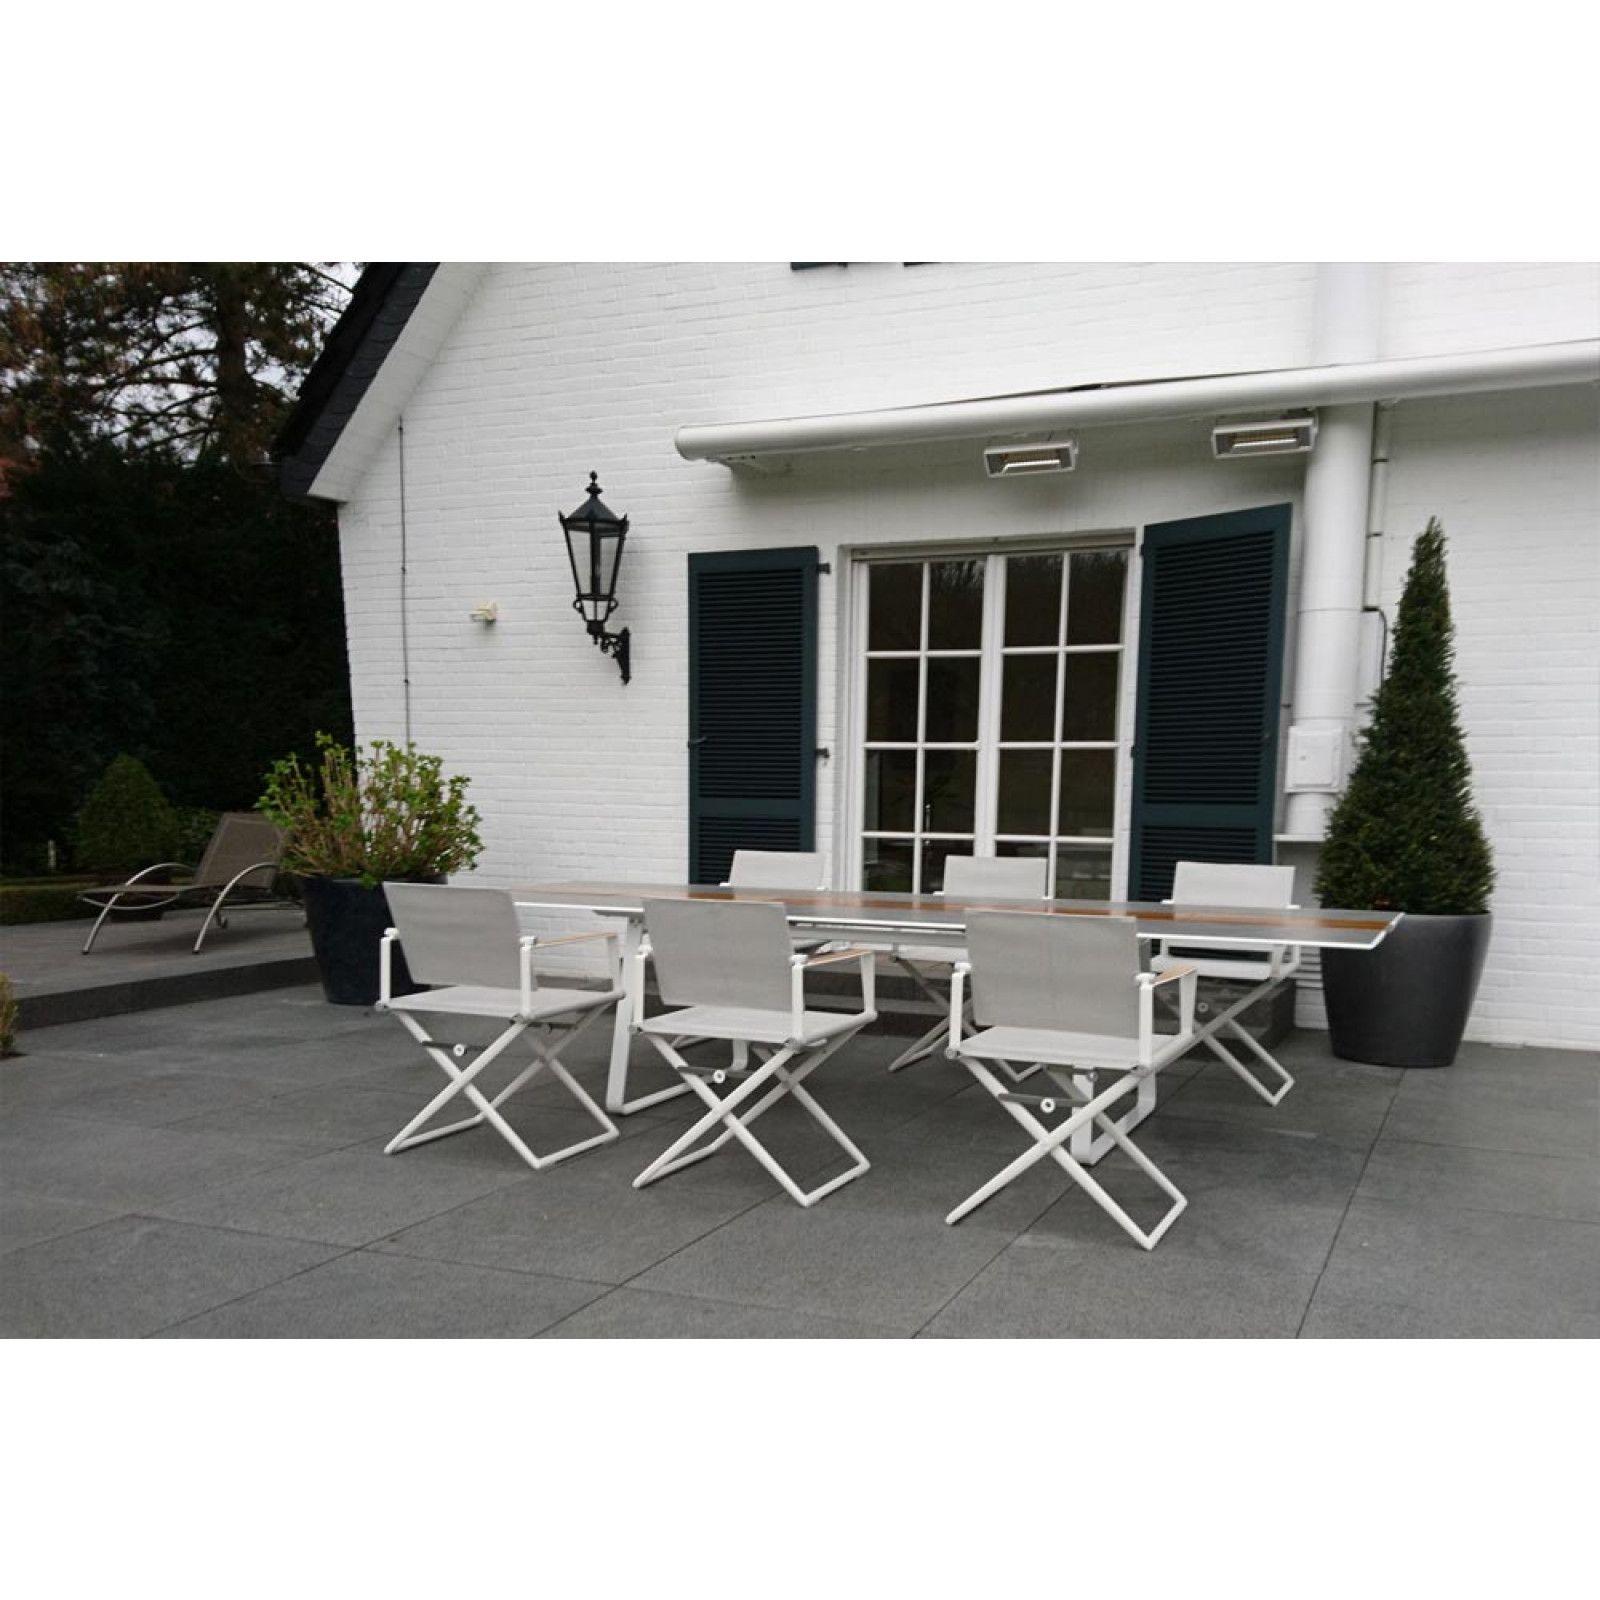 Dedon Seax Armlehnstuhl Klappbar Gartenmobel Design